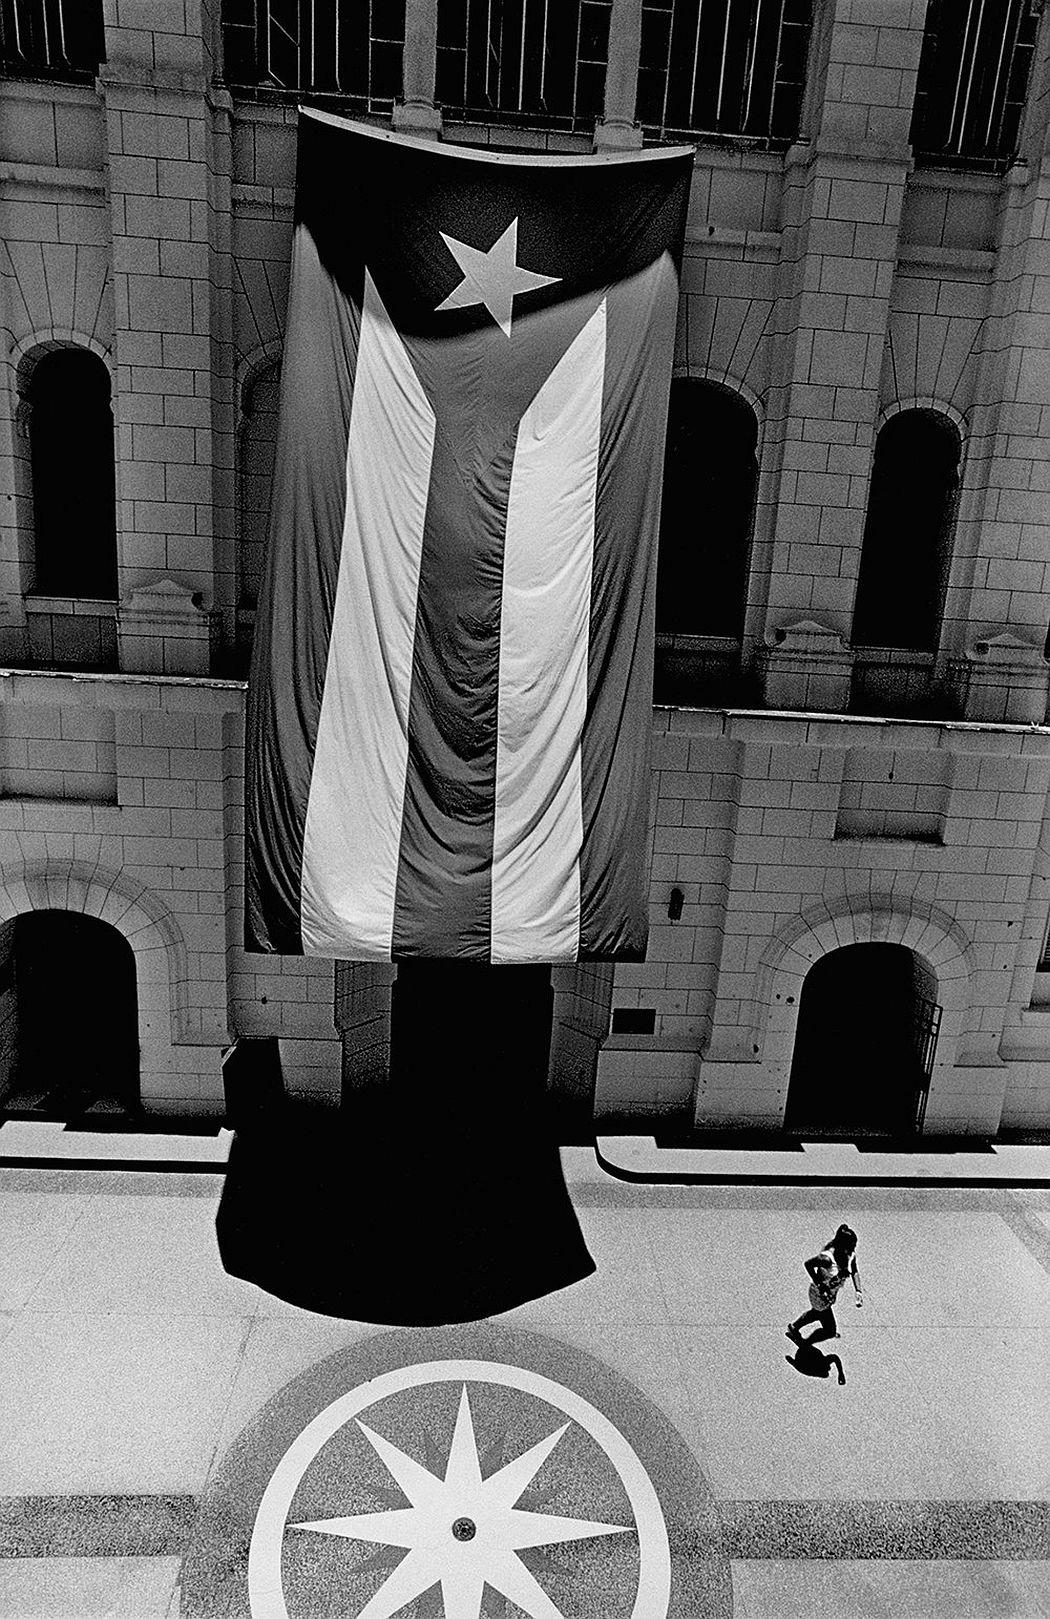 © CUBA by Elliott Erwitt, published by teNeues, www.teneues.com, Museo de la Revolución, Havana, 2015, Photo © 2017 Elliott Erwitt/Magnum Photos. All rights reserved.